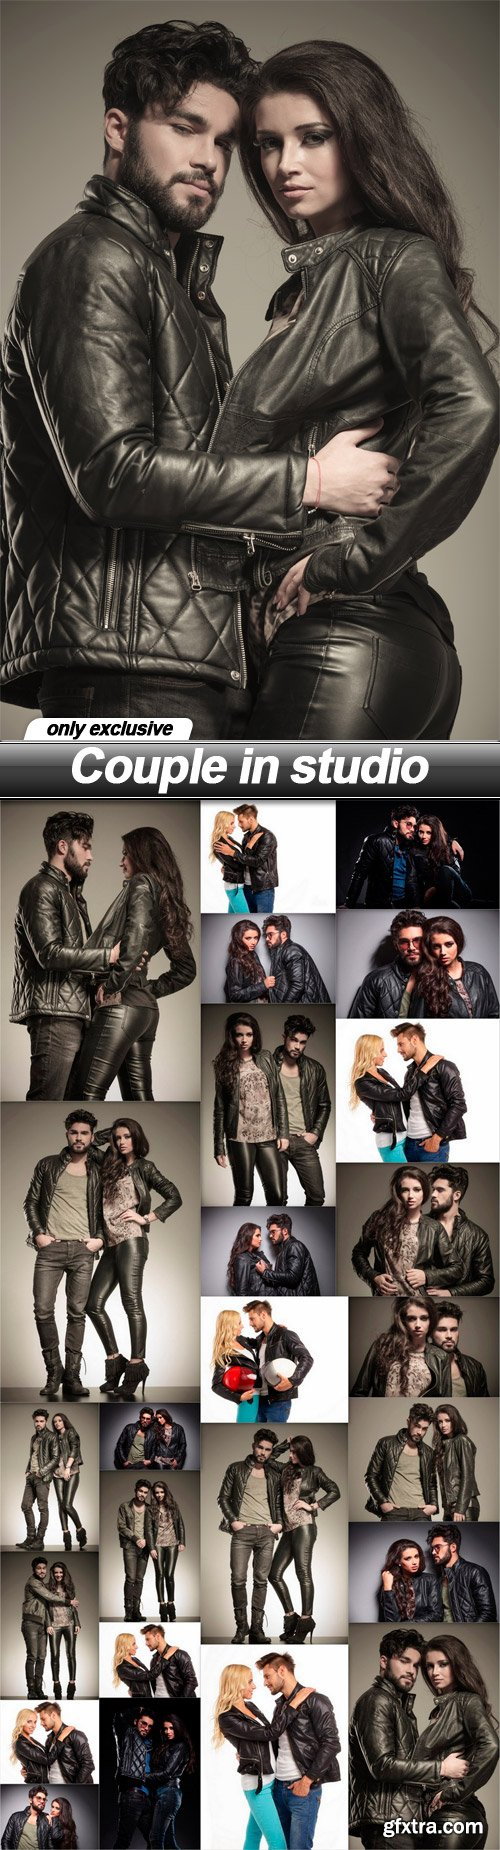 Couple in studio - 25 UHQ JPEG